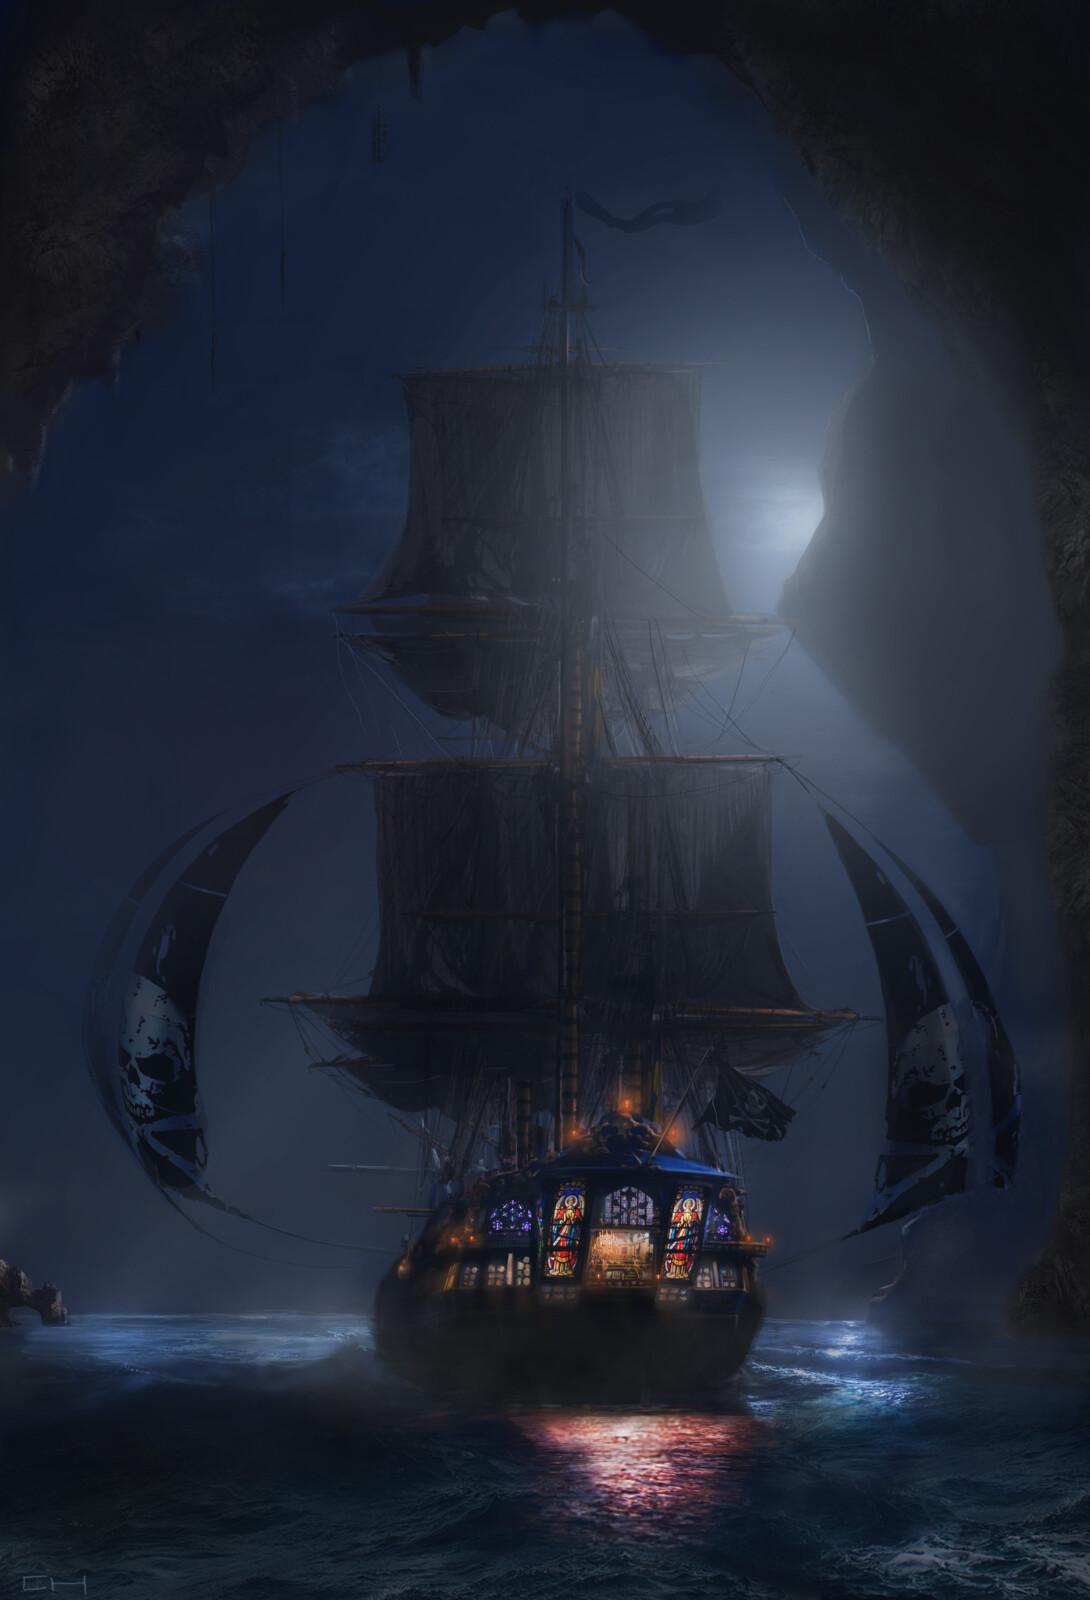 Grand Pirate Ship